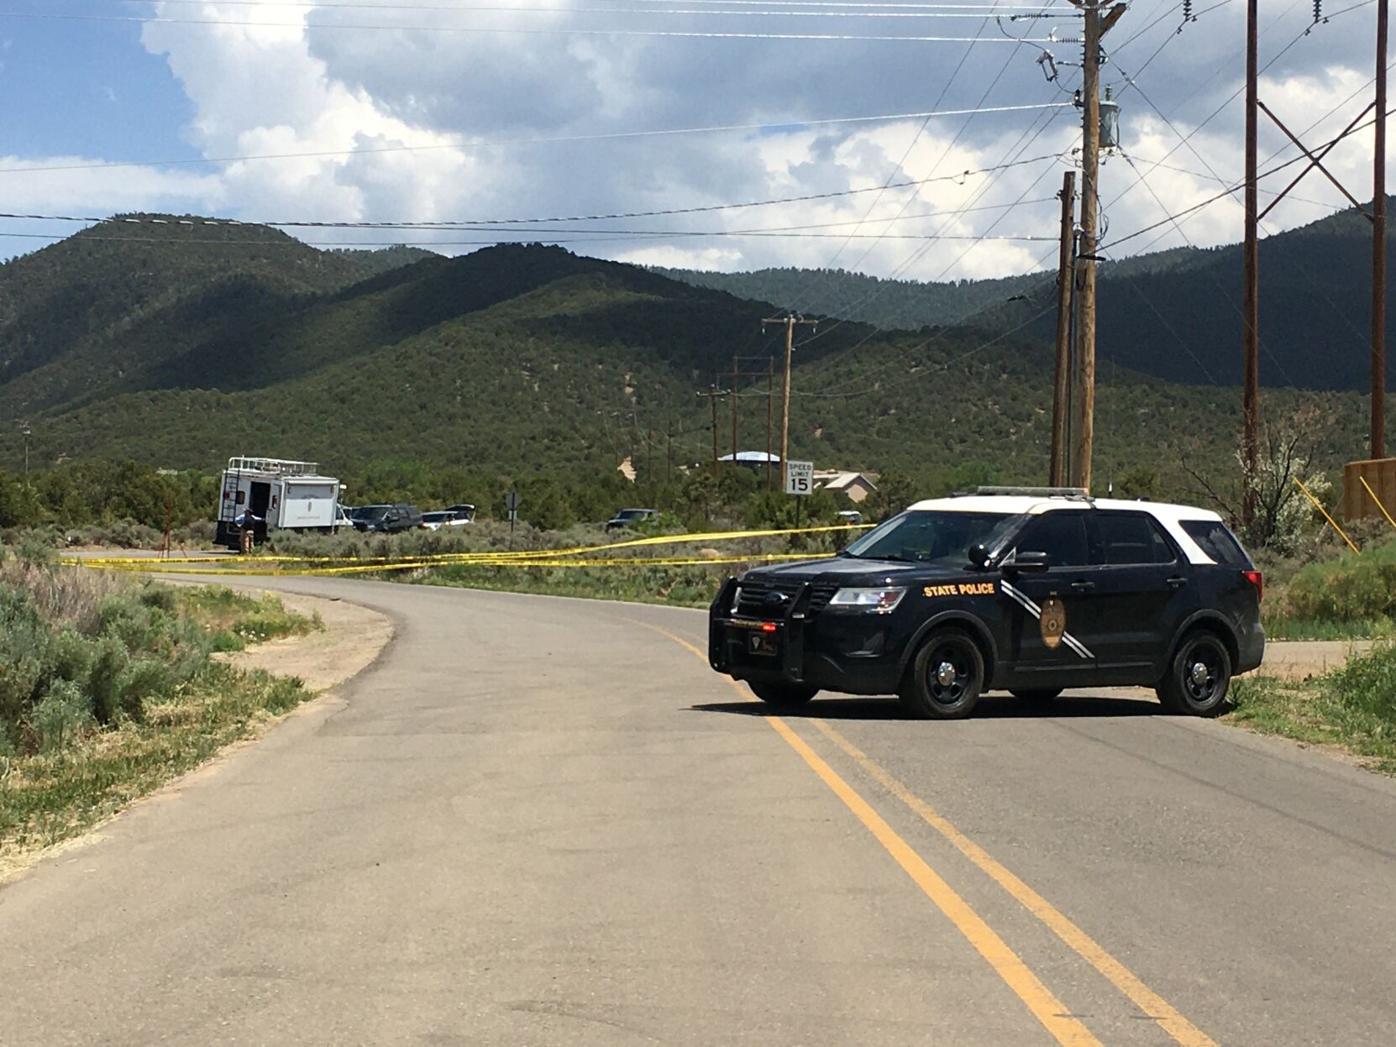 Officer involved shooting on Cruz Alta